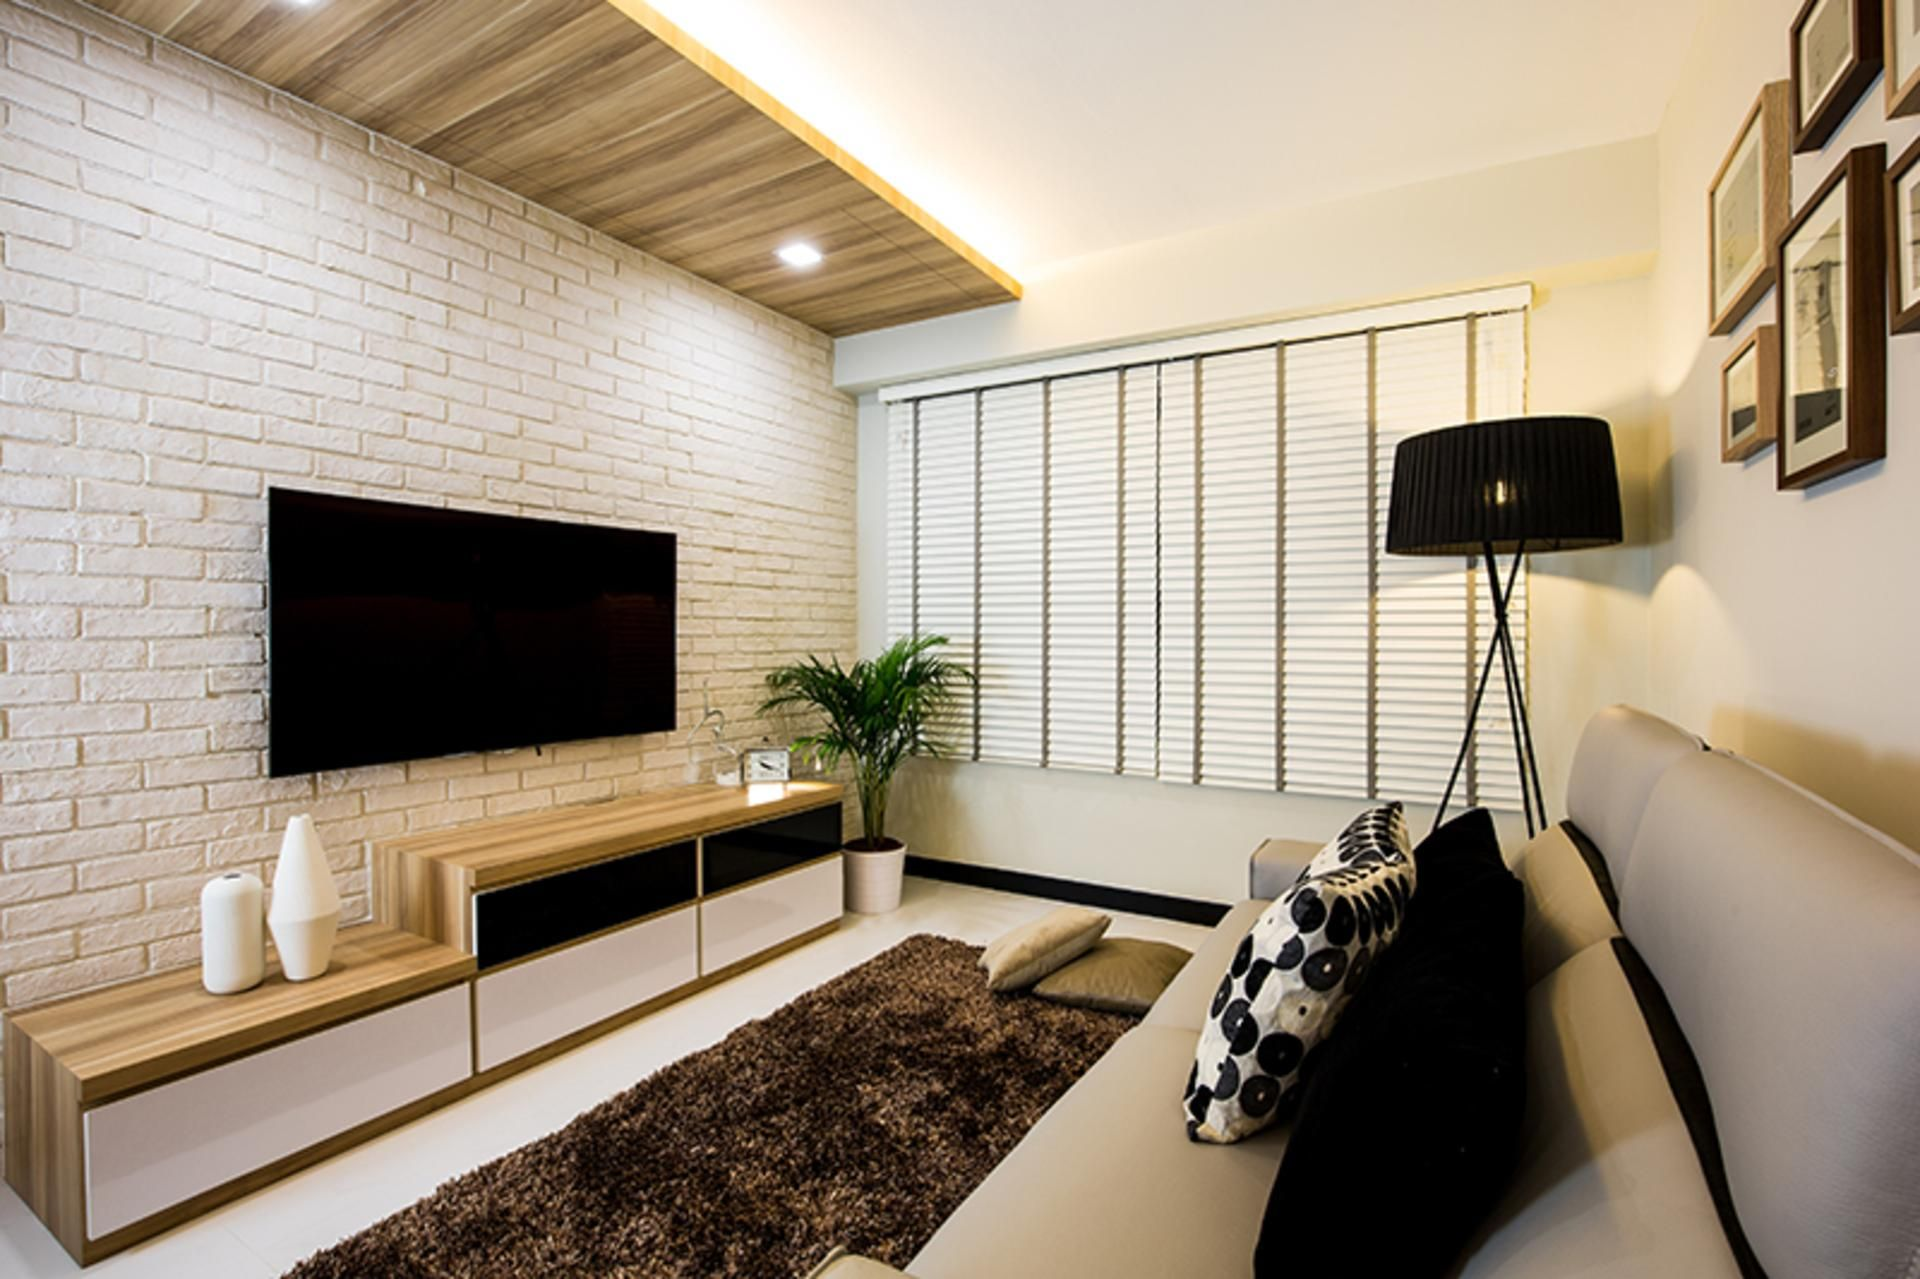 Qanvast   Home Design, Renovation, Remodelling U0026 Furnishing Ideas